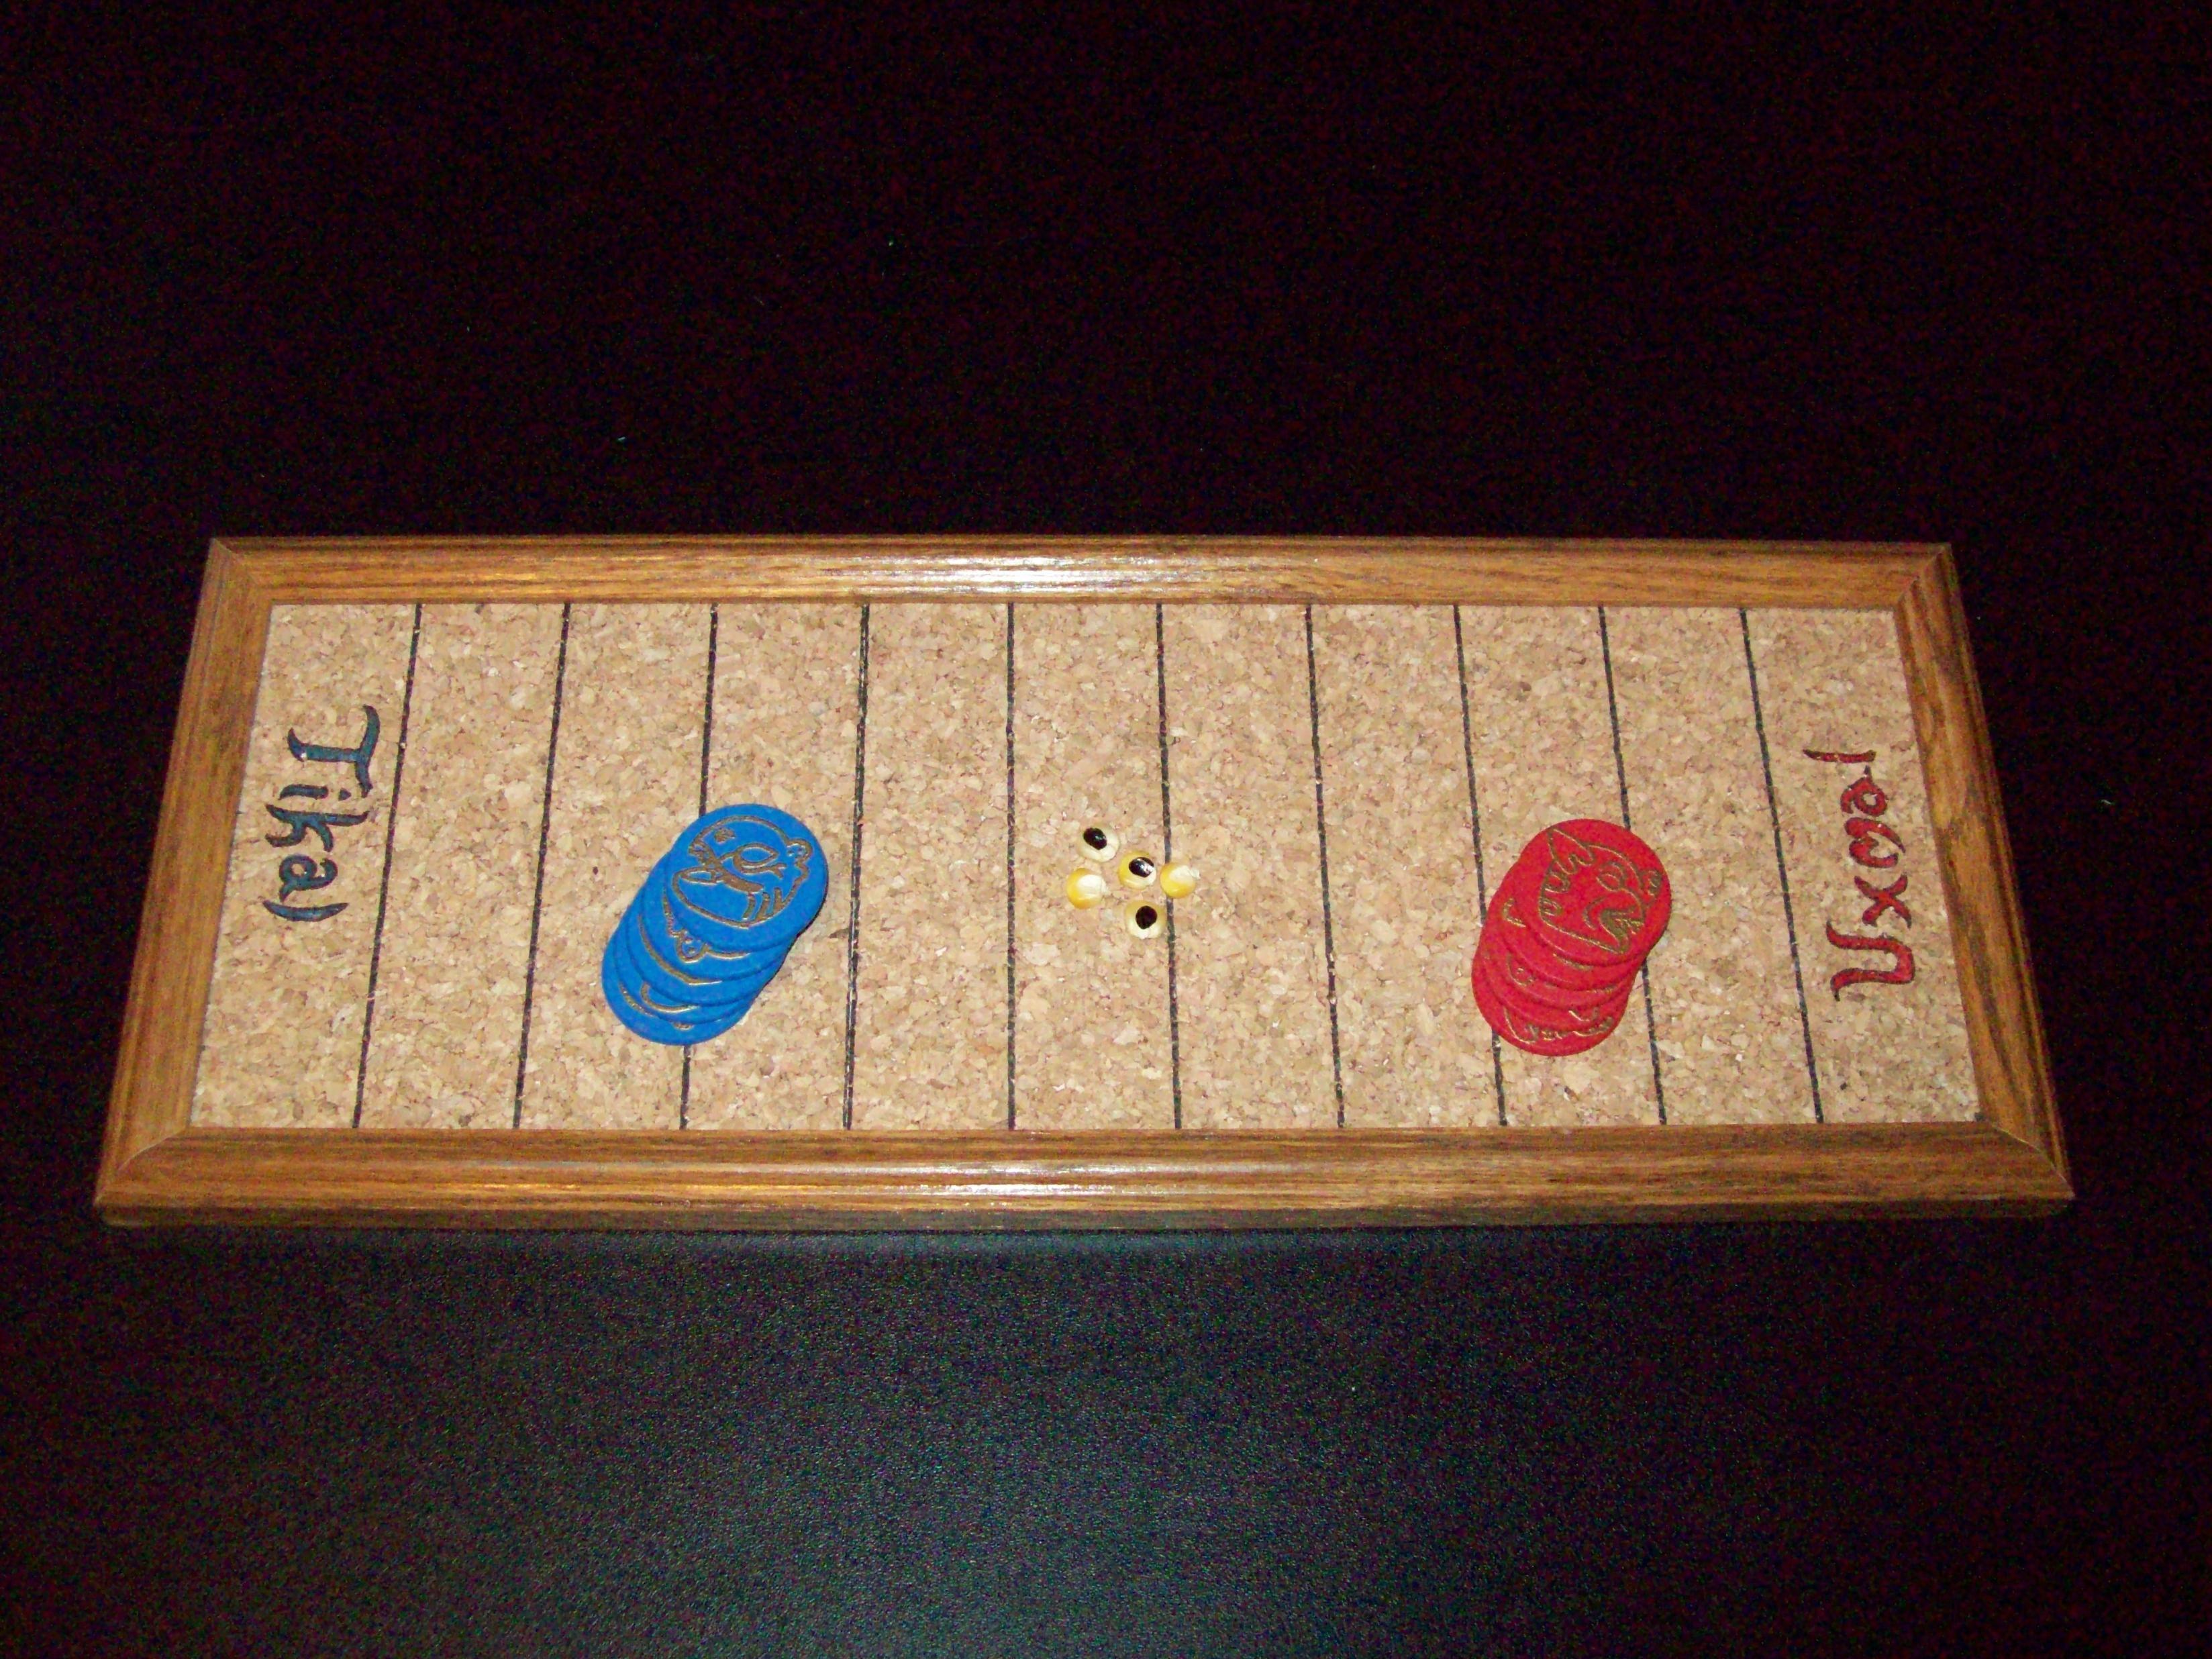 Bul is an ancient Mayan game Itu0027s